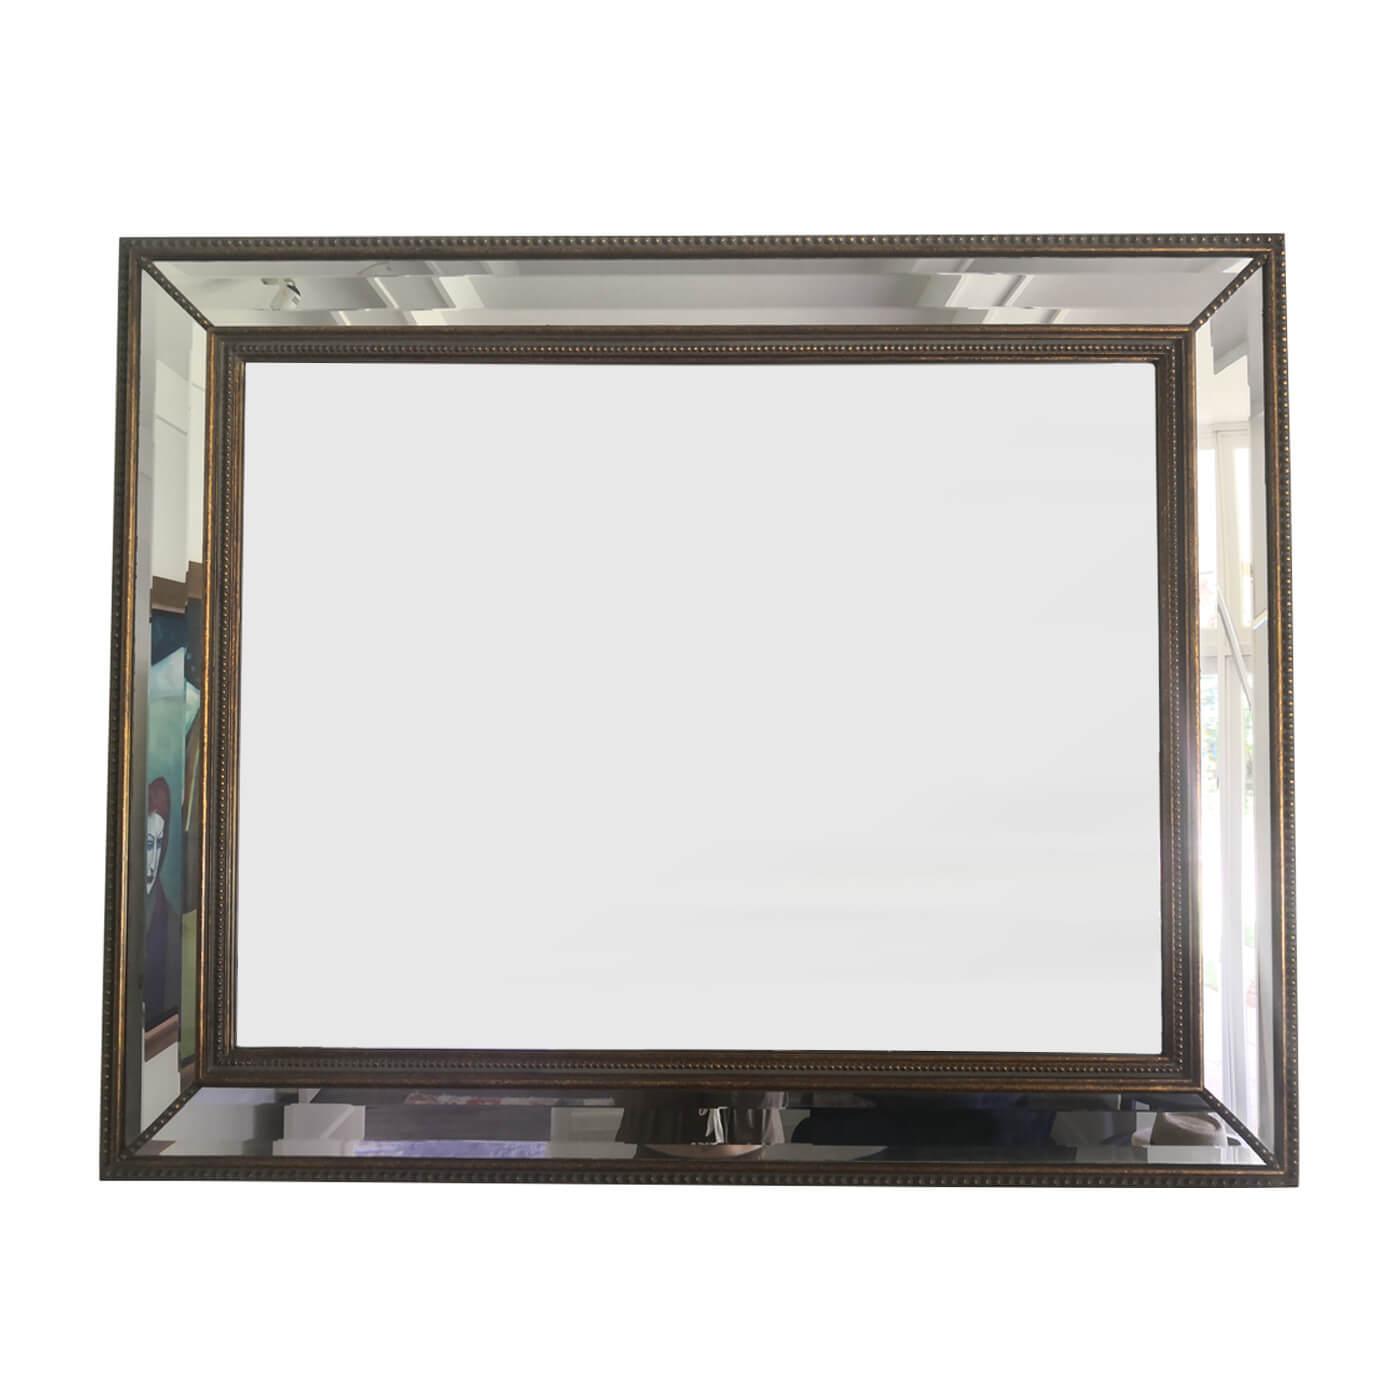 Antique cushion framed mirror